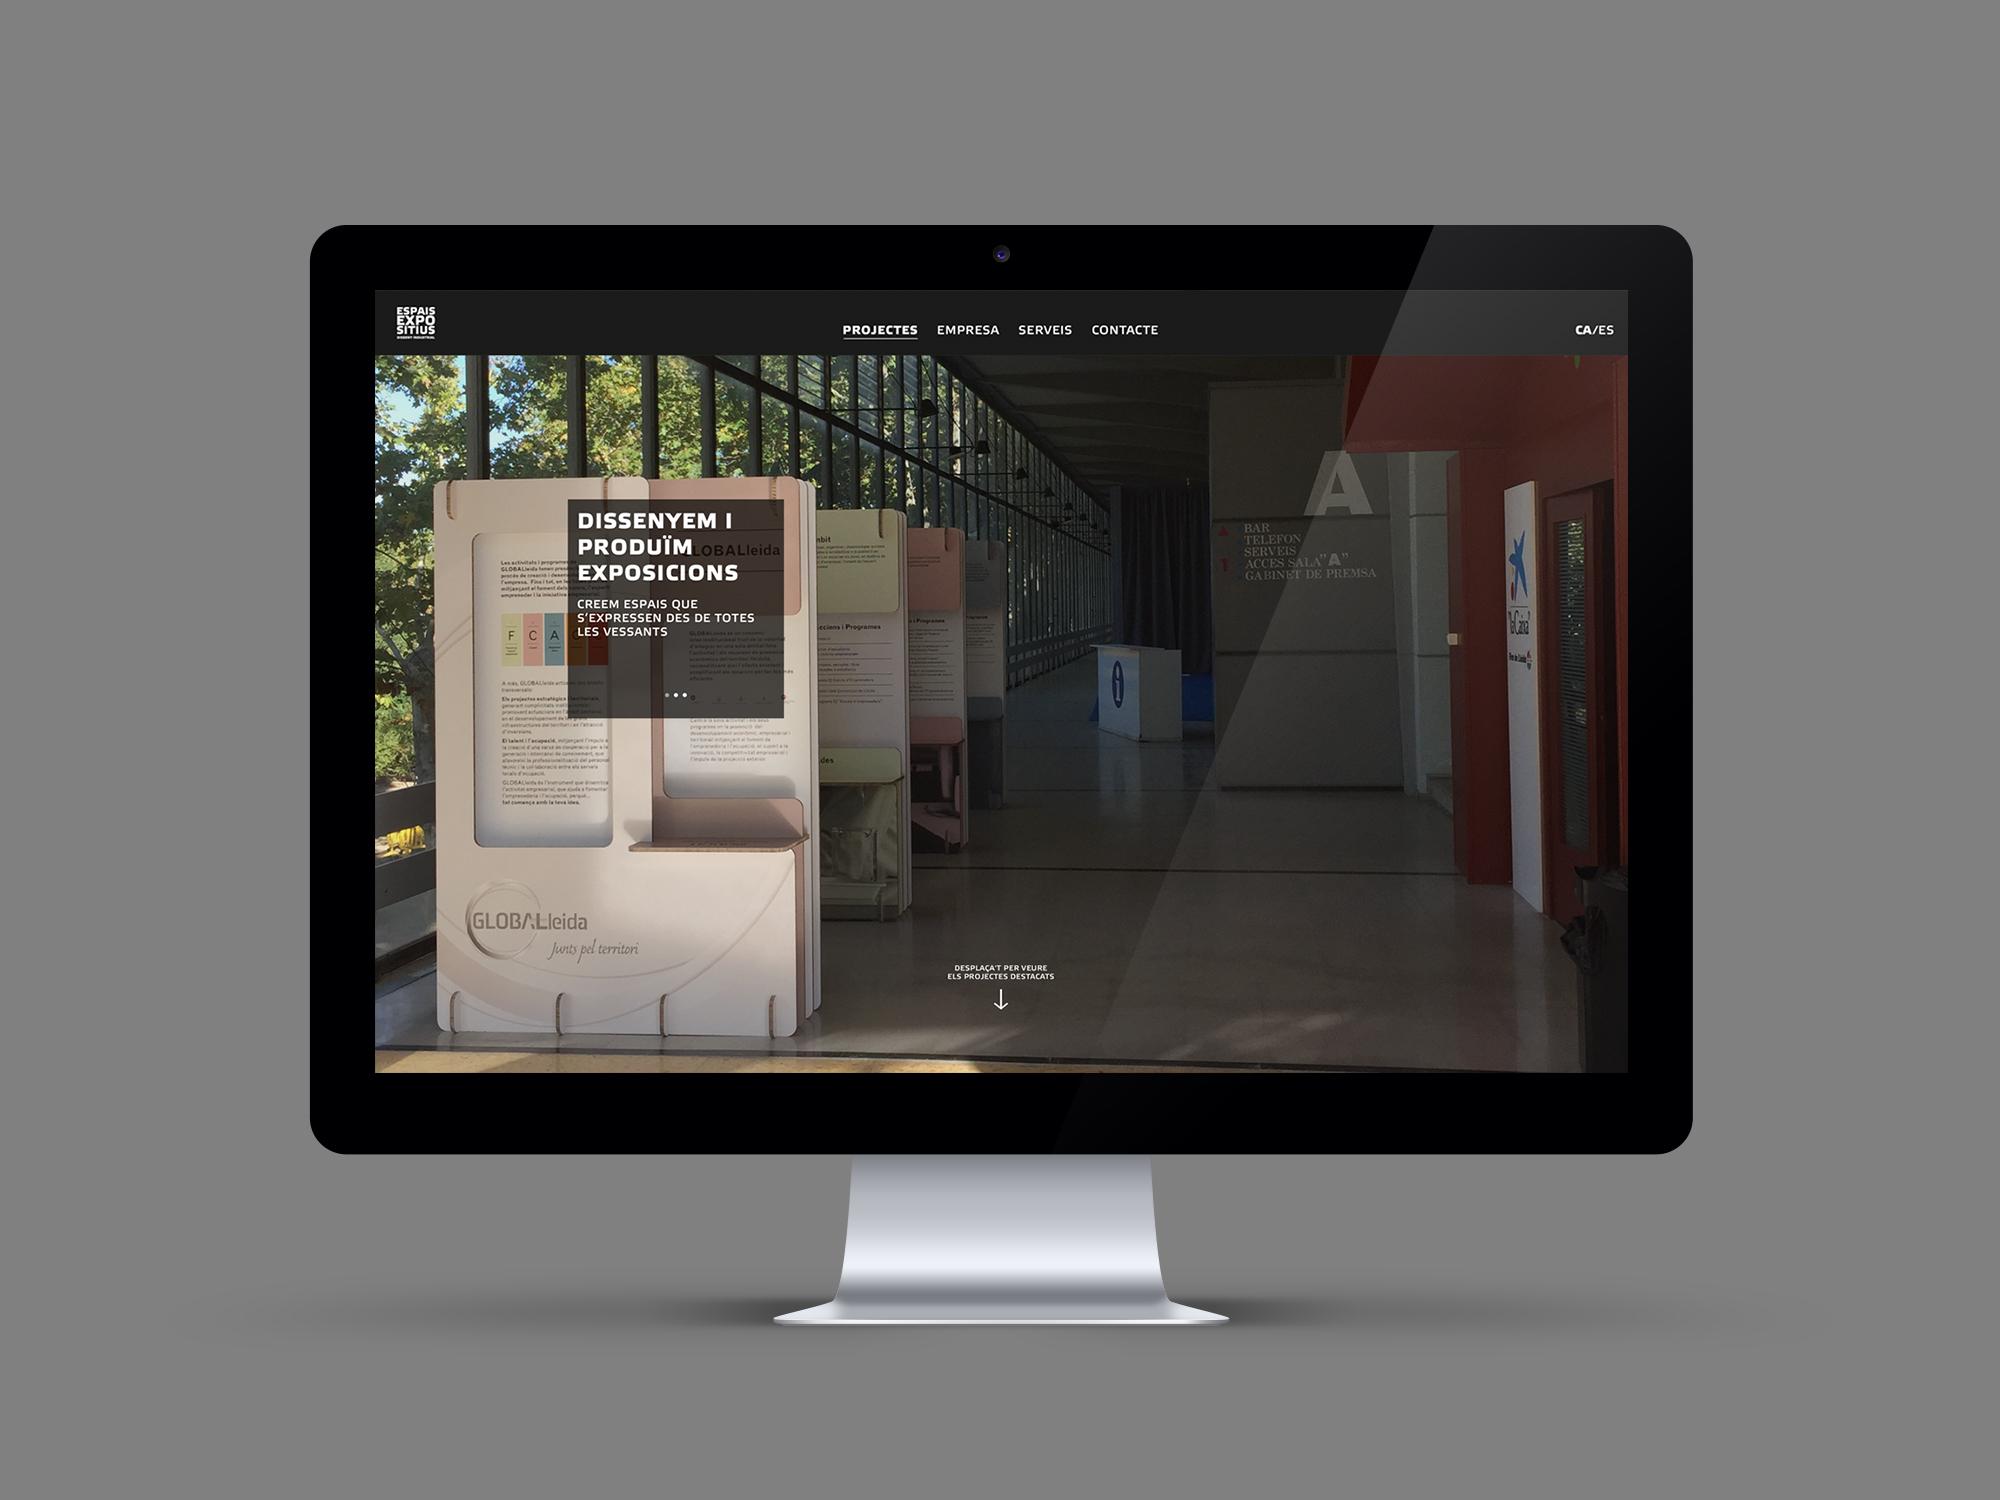 Disseny web responsive Espais expositius Latipo